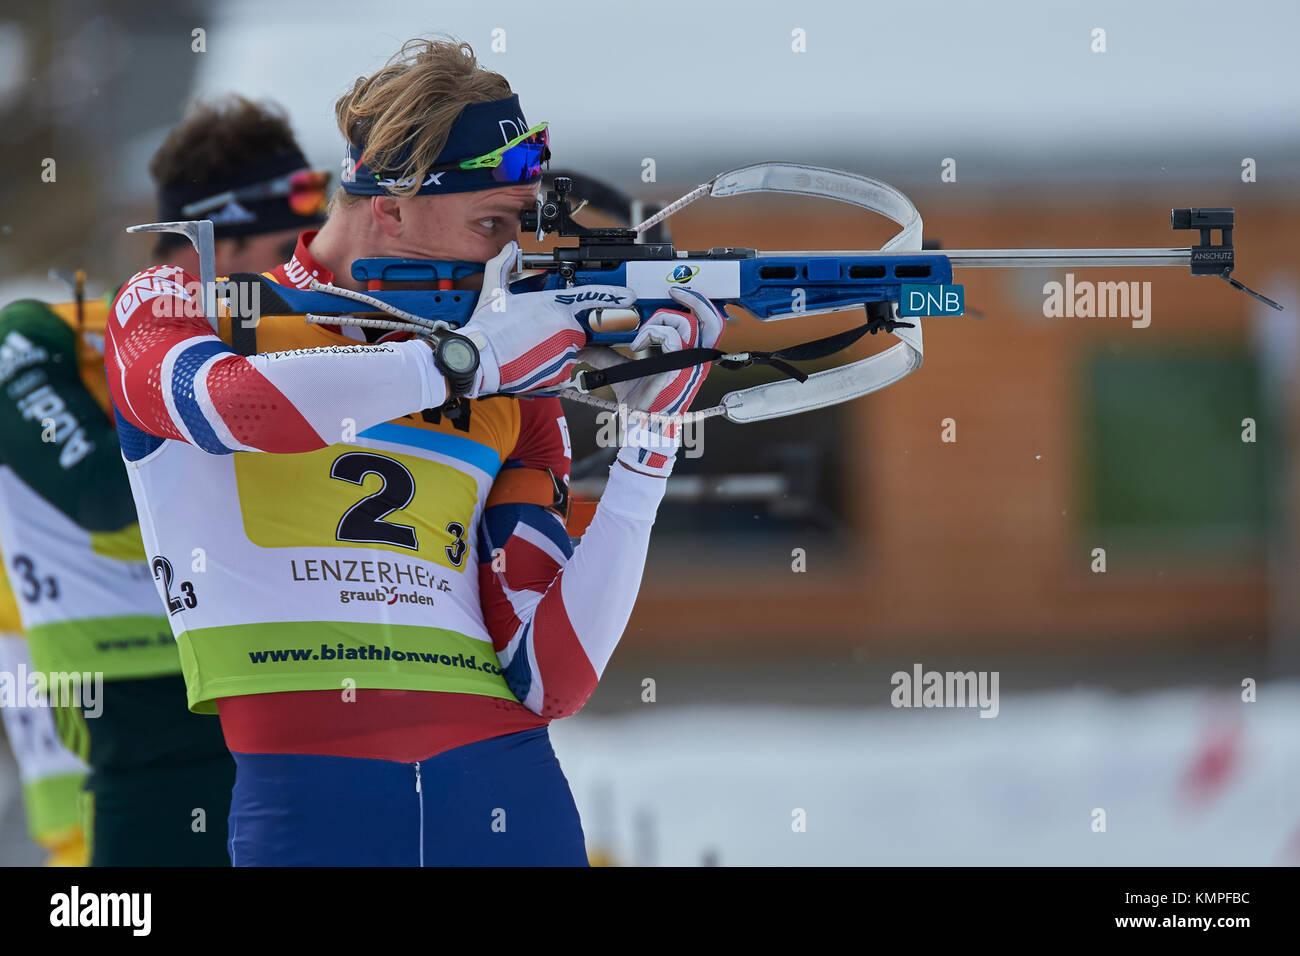 Lenzerheide, Switzerland. 8th Dec, 2017. ROERVIK Fredrik (NOR) during the IBU Biathlon Cup Mixed Relay in Lenzerheide. - Stock Image